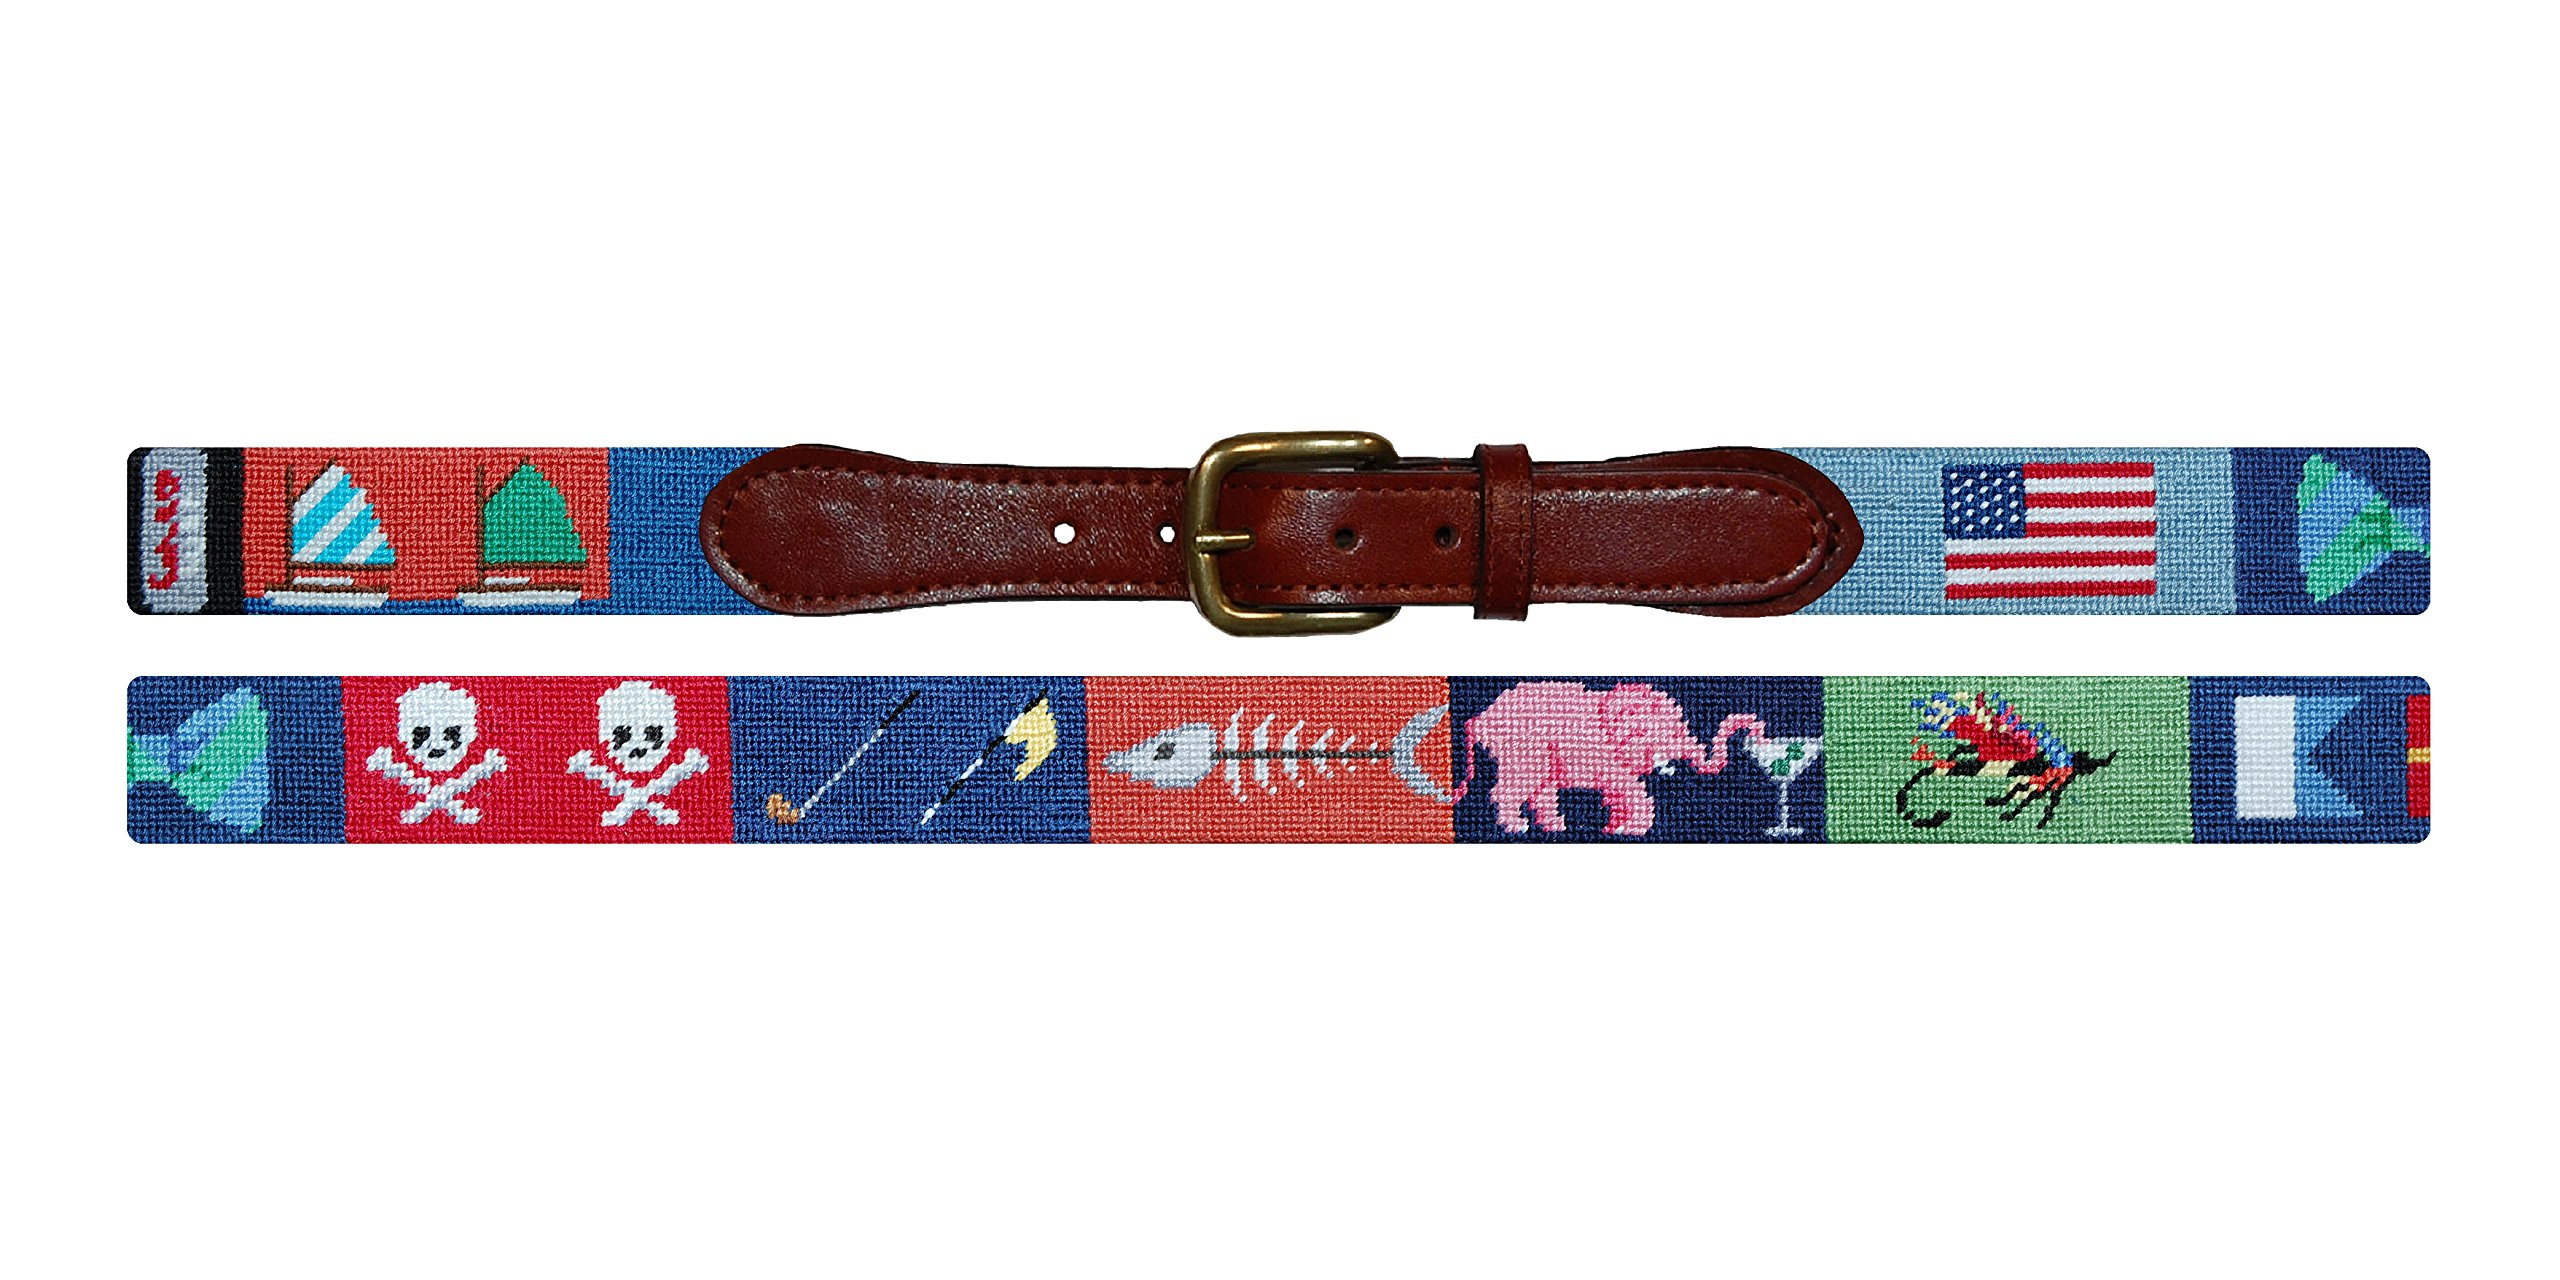 Smathers & Branson Greatest Hits Traditional Needlepoint Belt, Size 40 (B-251-40) by Smathers & Branson (Image #1)